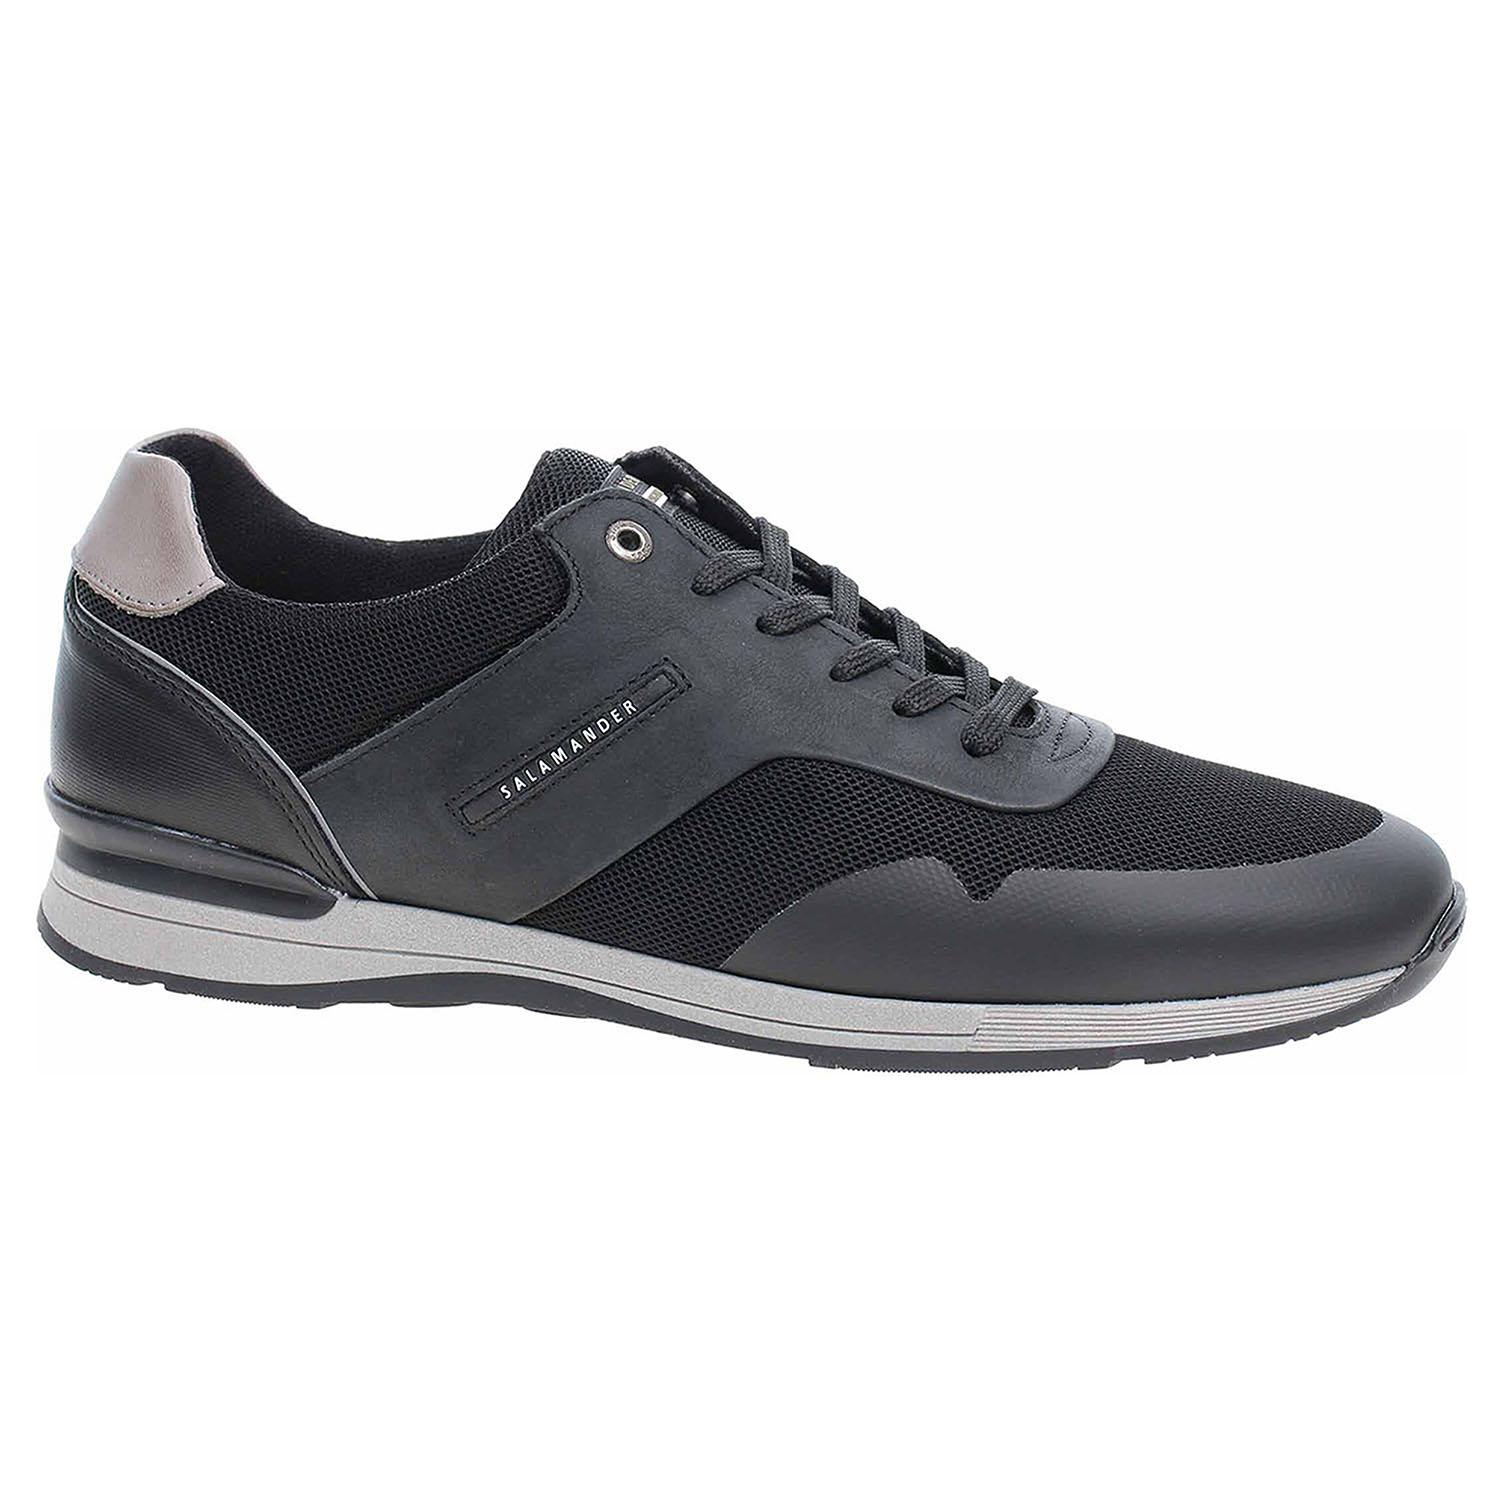 6f593bbf89 Ecco Pánská obuv Salamander 31-56207-31 black-grey-black 24000523